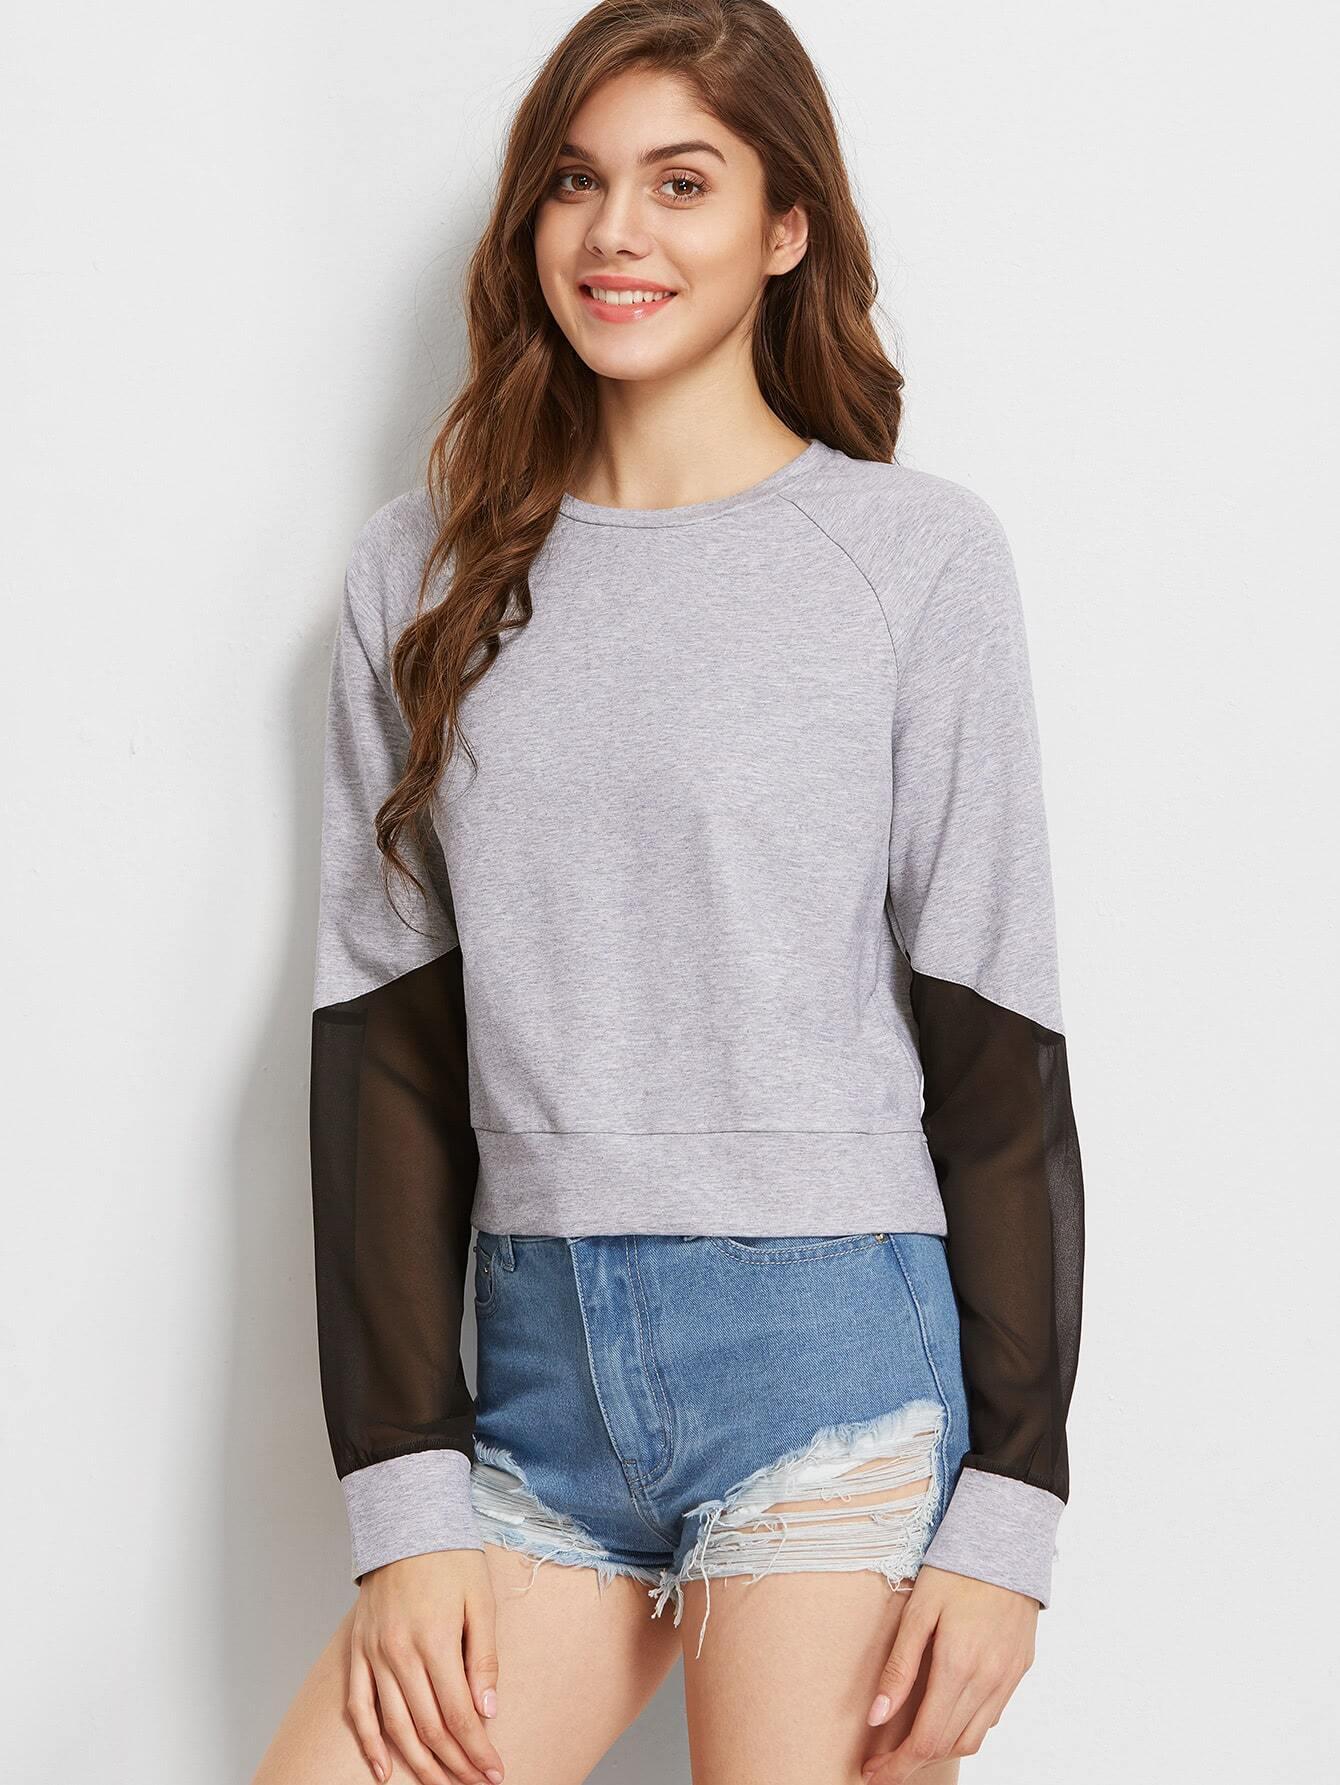 Heather Grey Mesh Insert Raglan Sleeve Sweatshirt two tone raglan sleeve sweatshirt